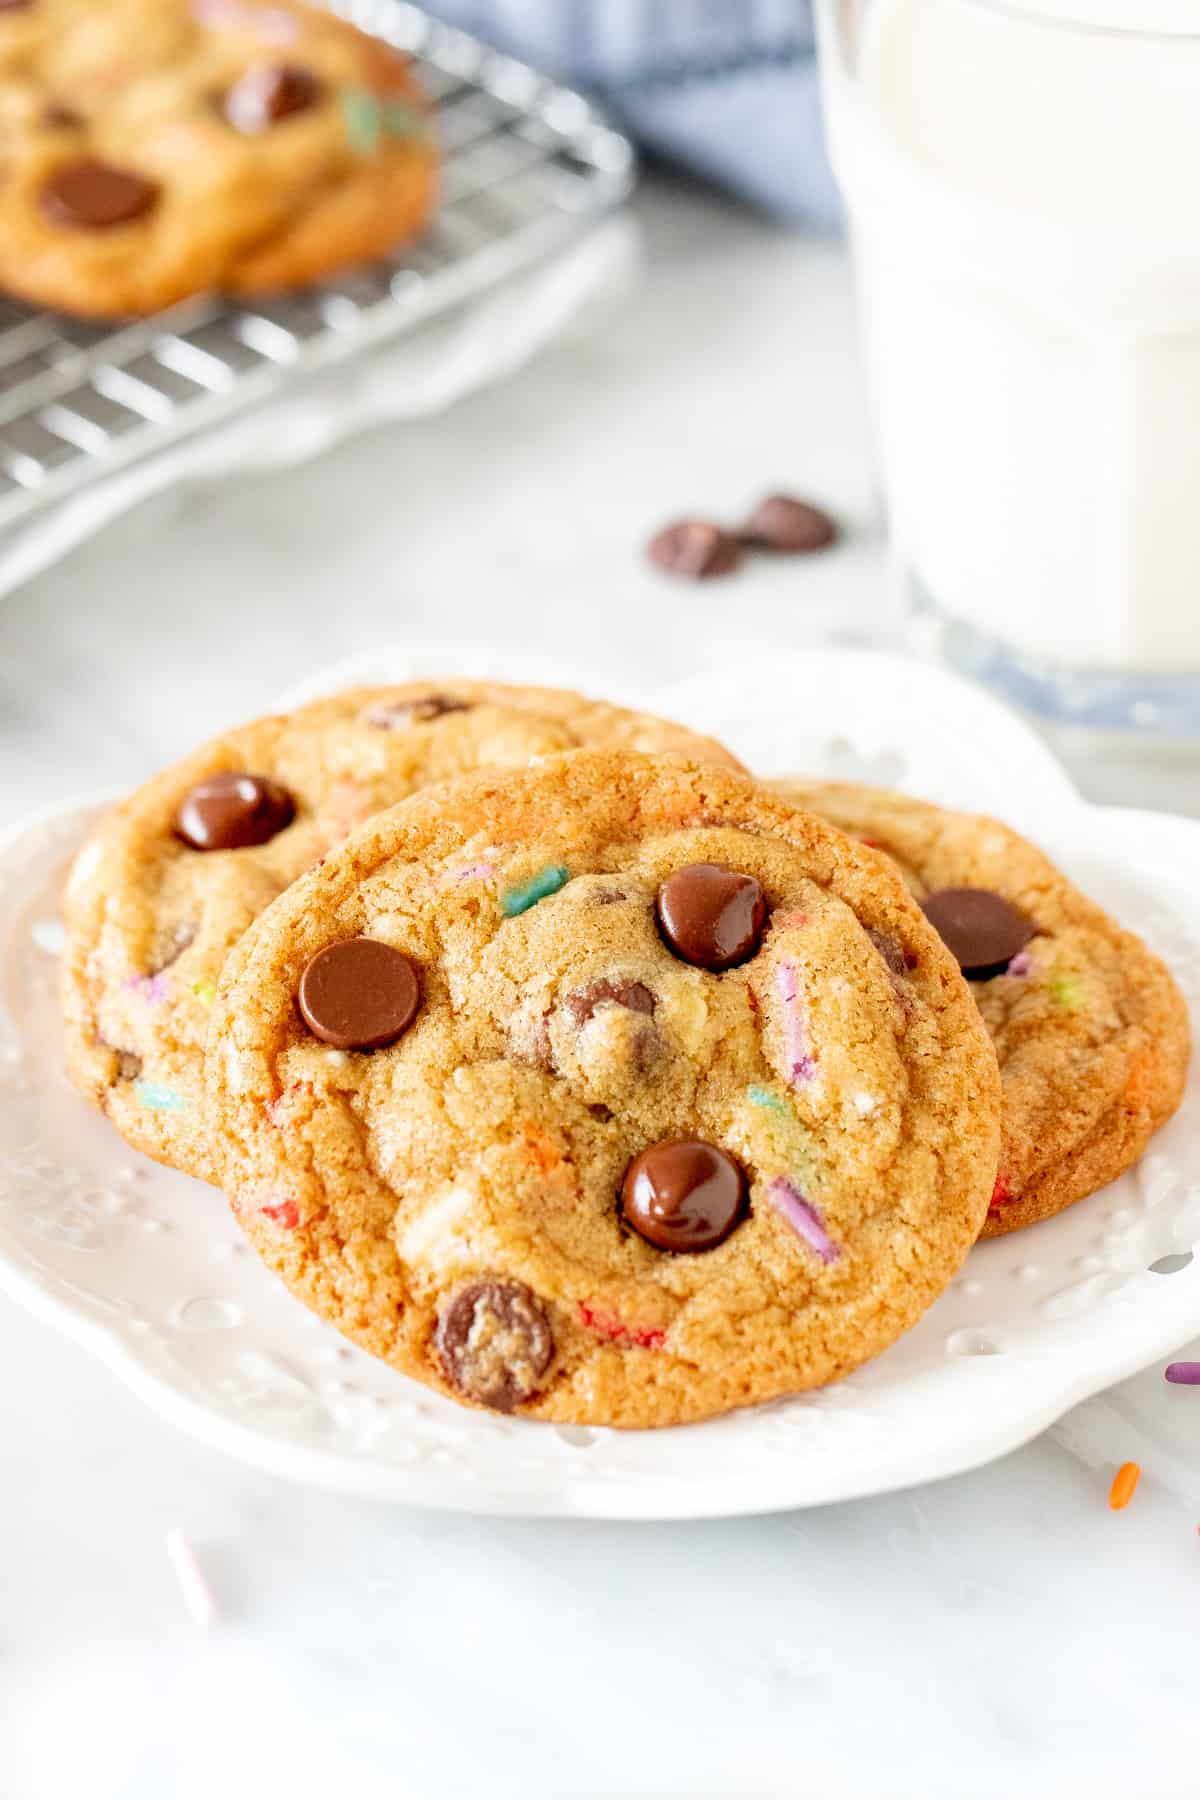 Plate of 3 sprinkle chocolate chip cookies